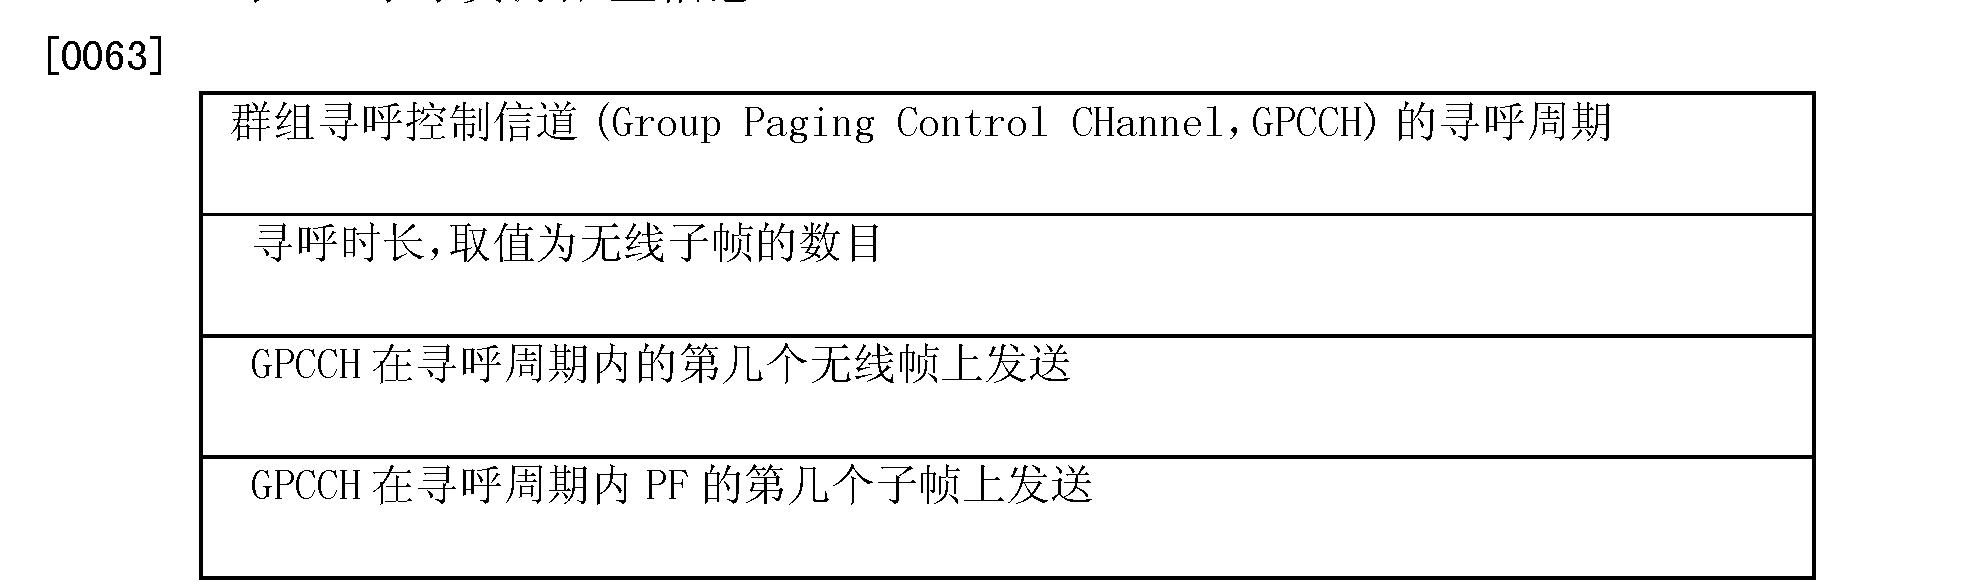 Figure CN103228015AD00101